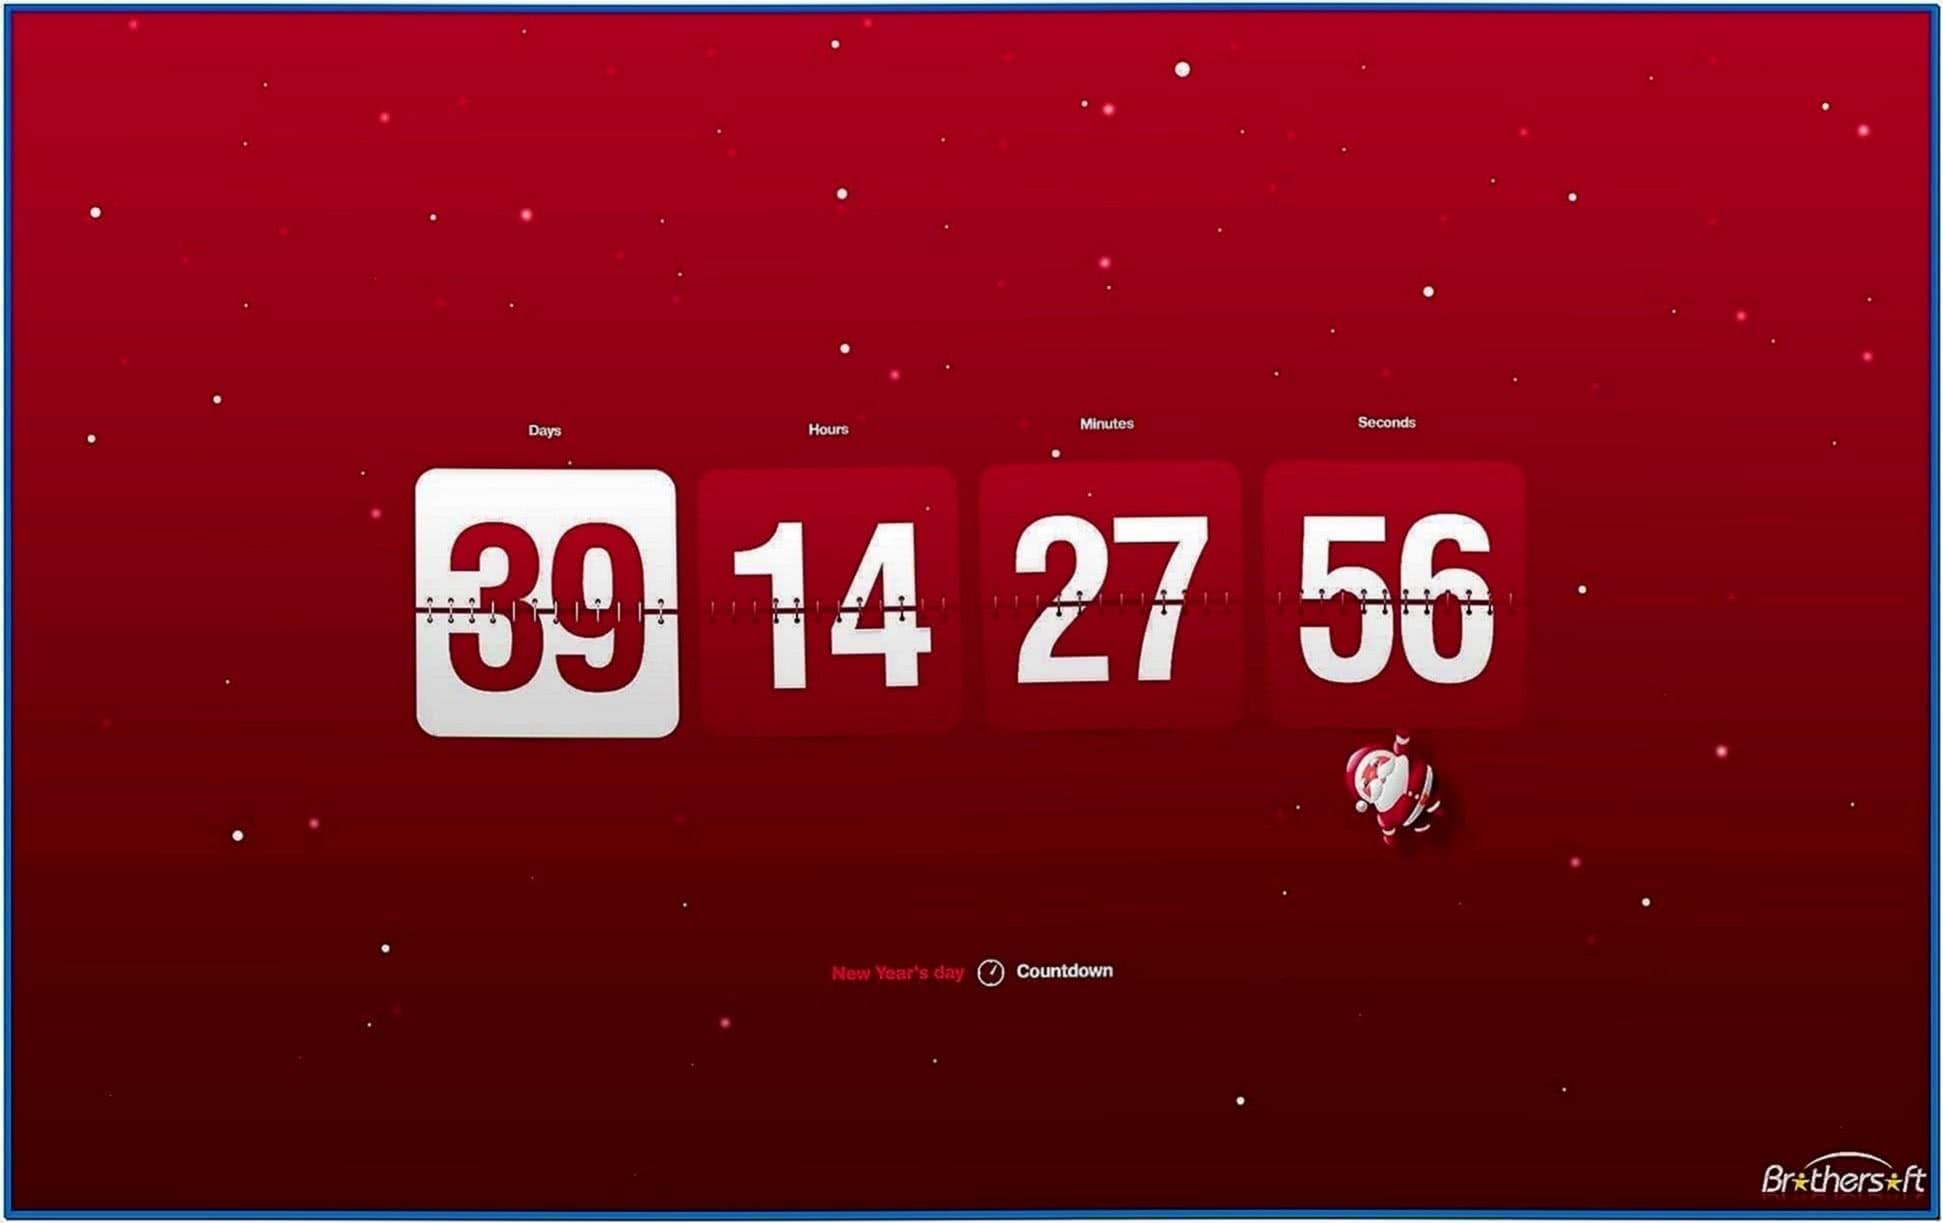 Happy New Year Countdown Screensaver